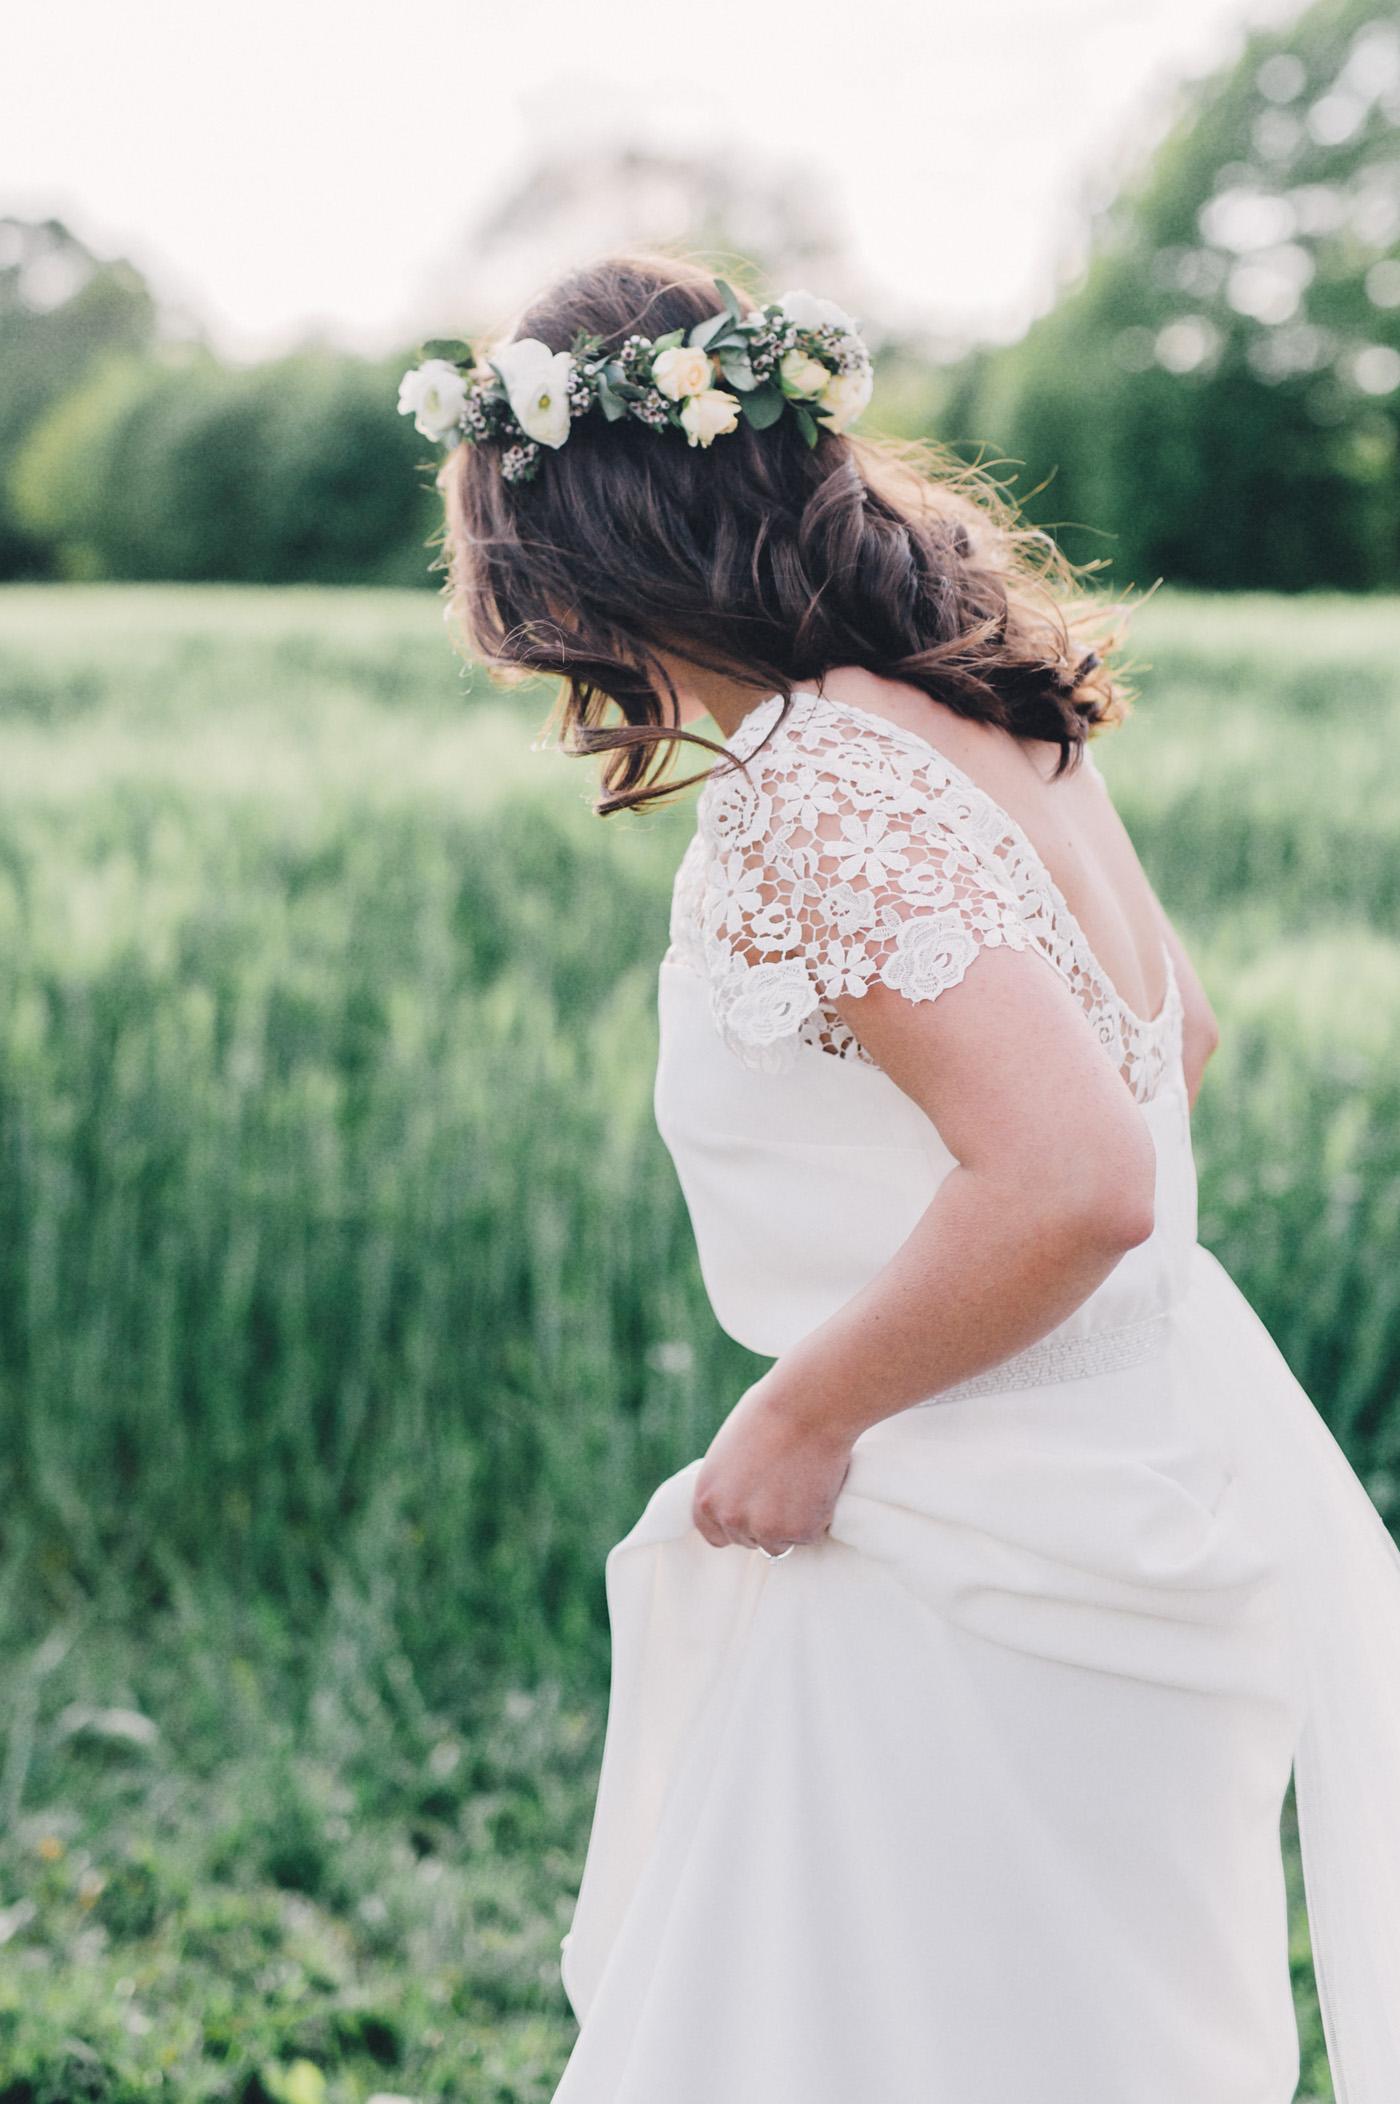 diy-wedding-nothenhof-hoch-8